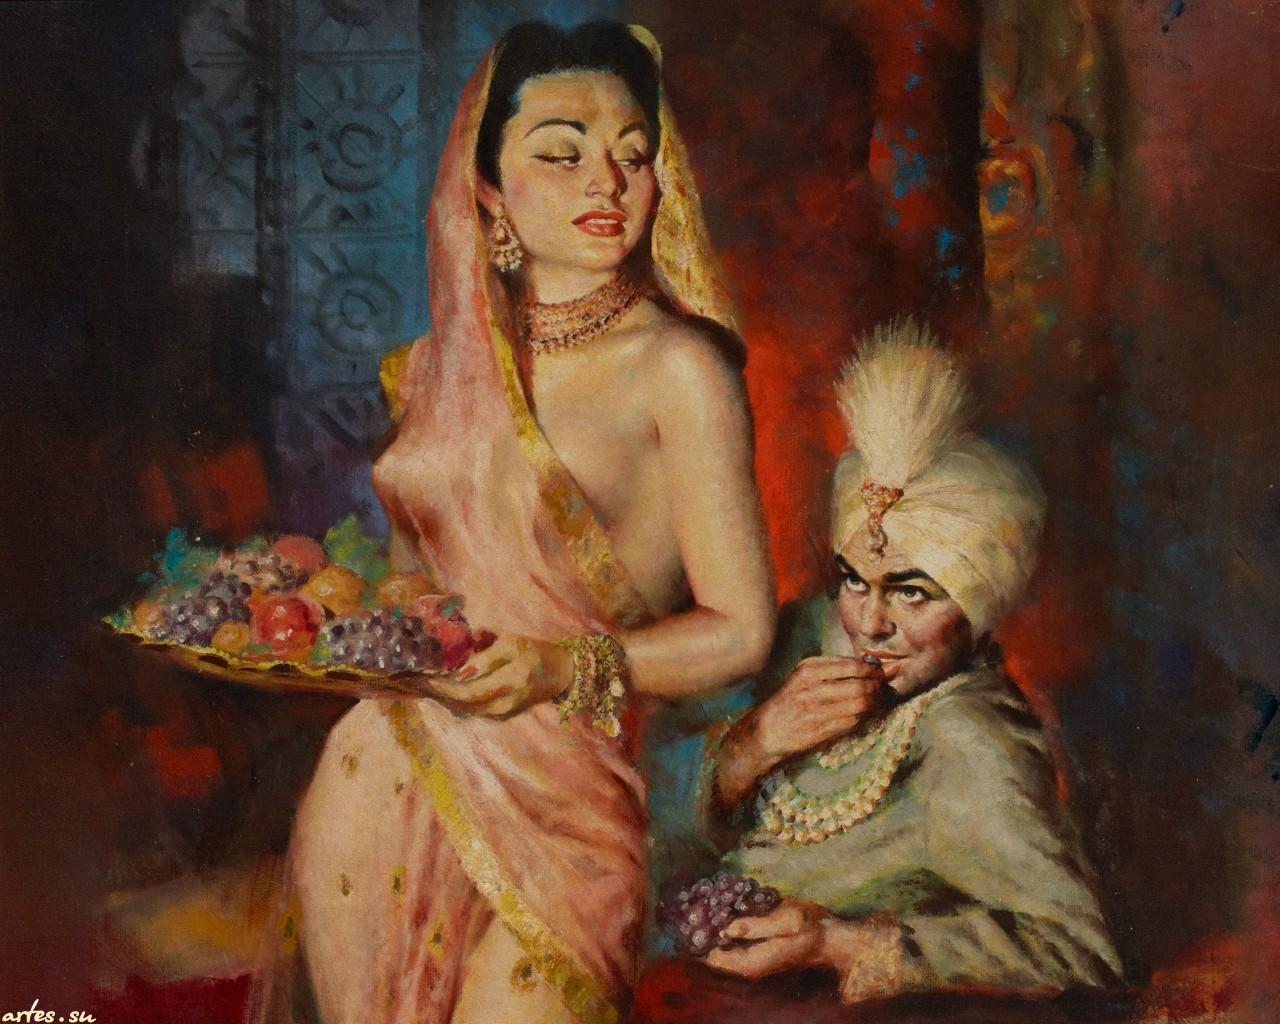 Harem slave sexy image